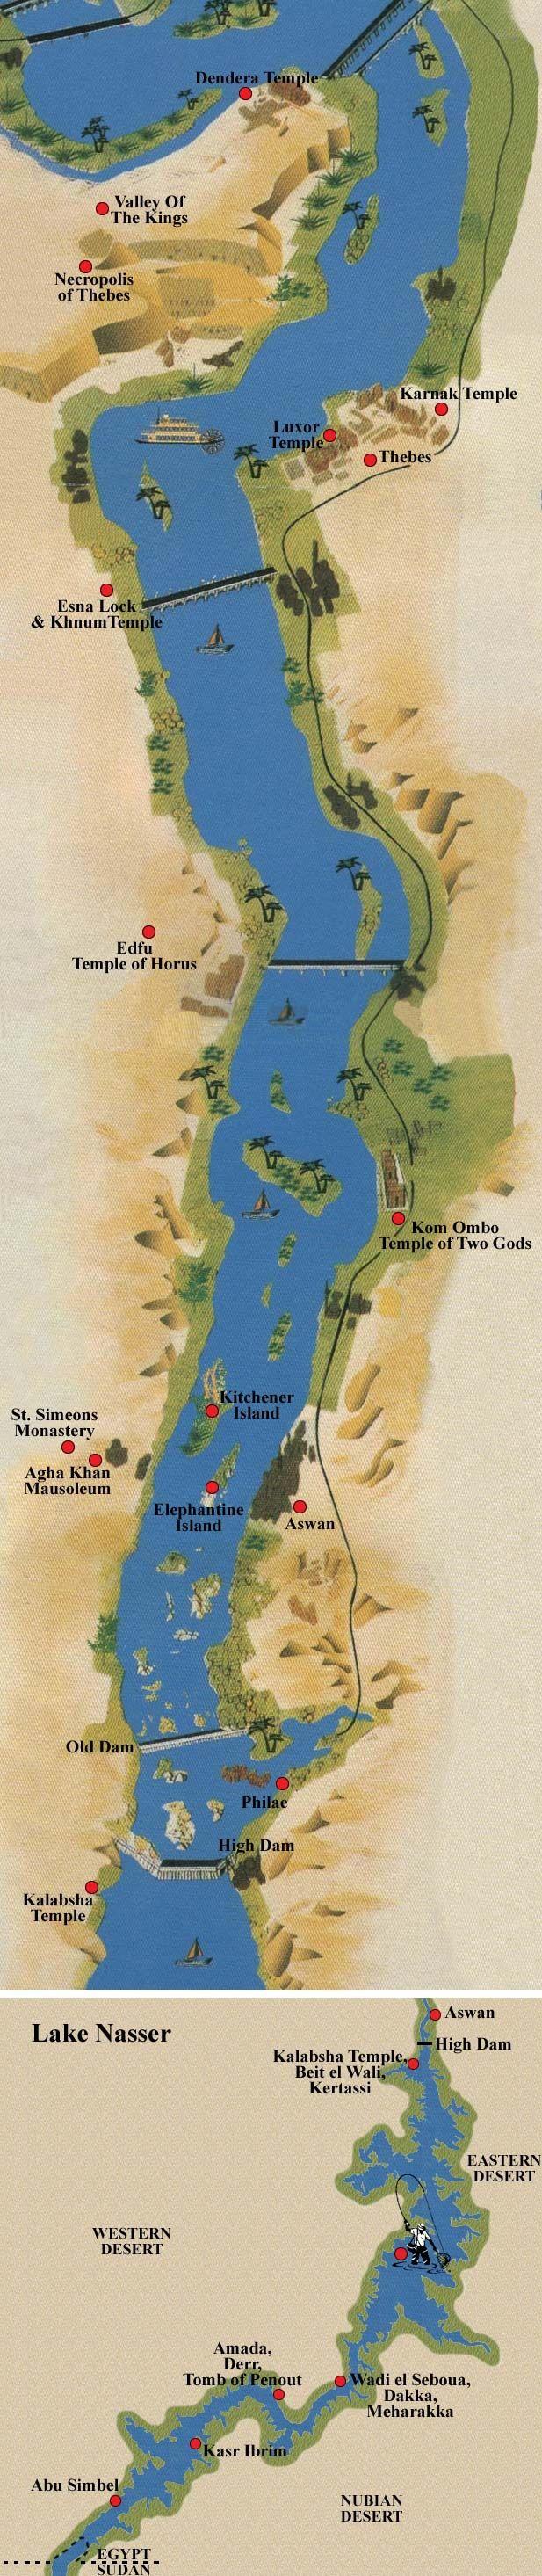 The Nile u003eu003eu003e Well a large part